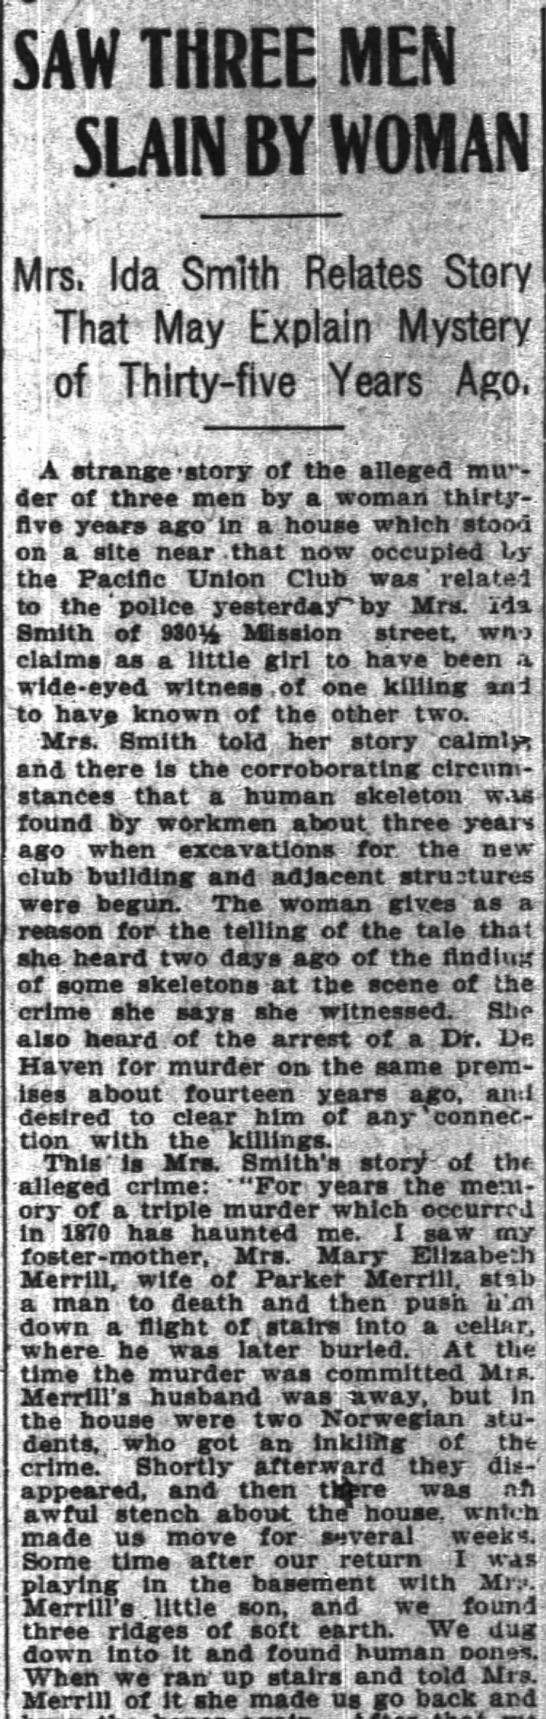 Murders committed by Mary Elizabeth Merrill (Mrs. Parker Merrill) in 1870 - SAW THREE MEN - tSLAIN BY WOMAN v T Mrs...